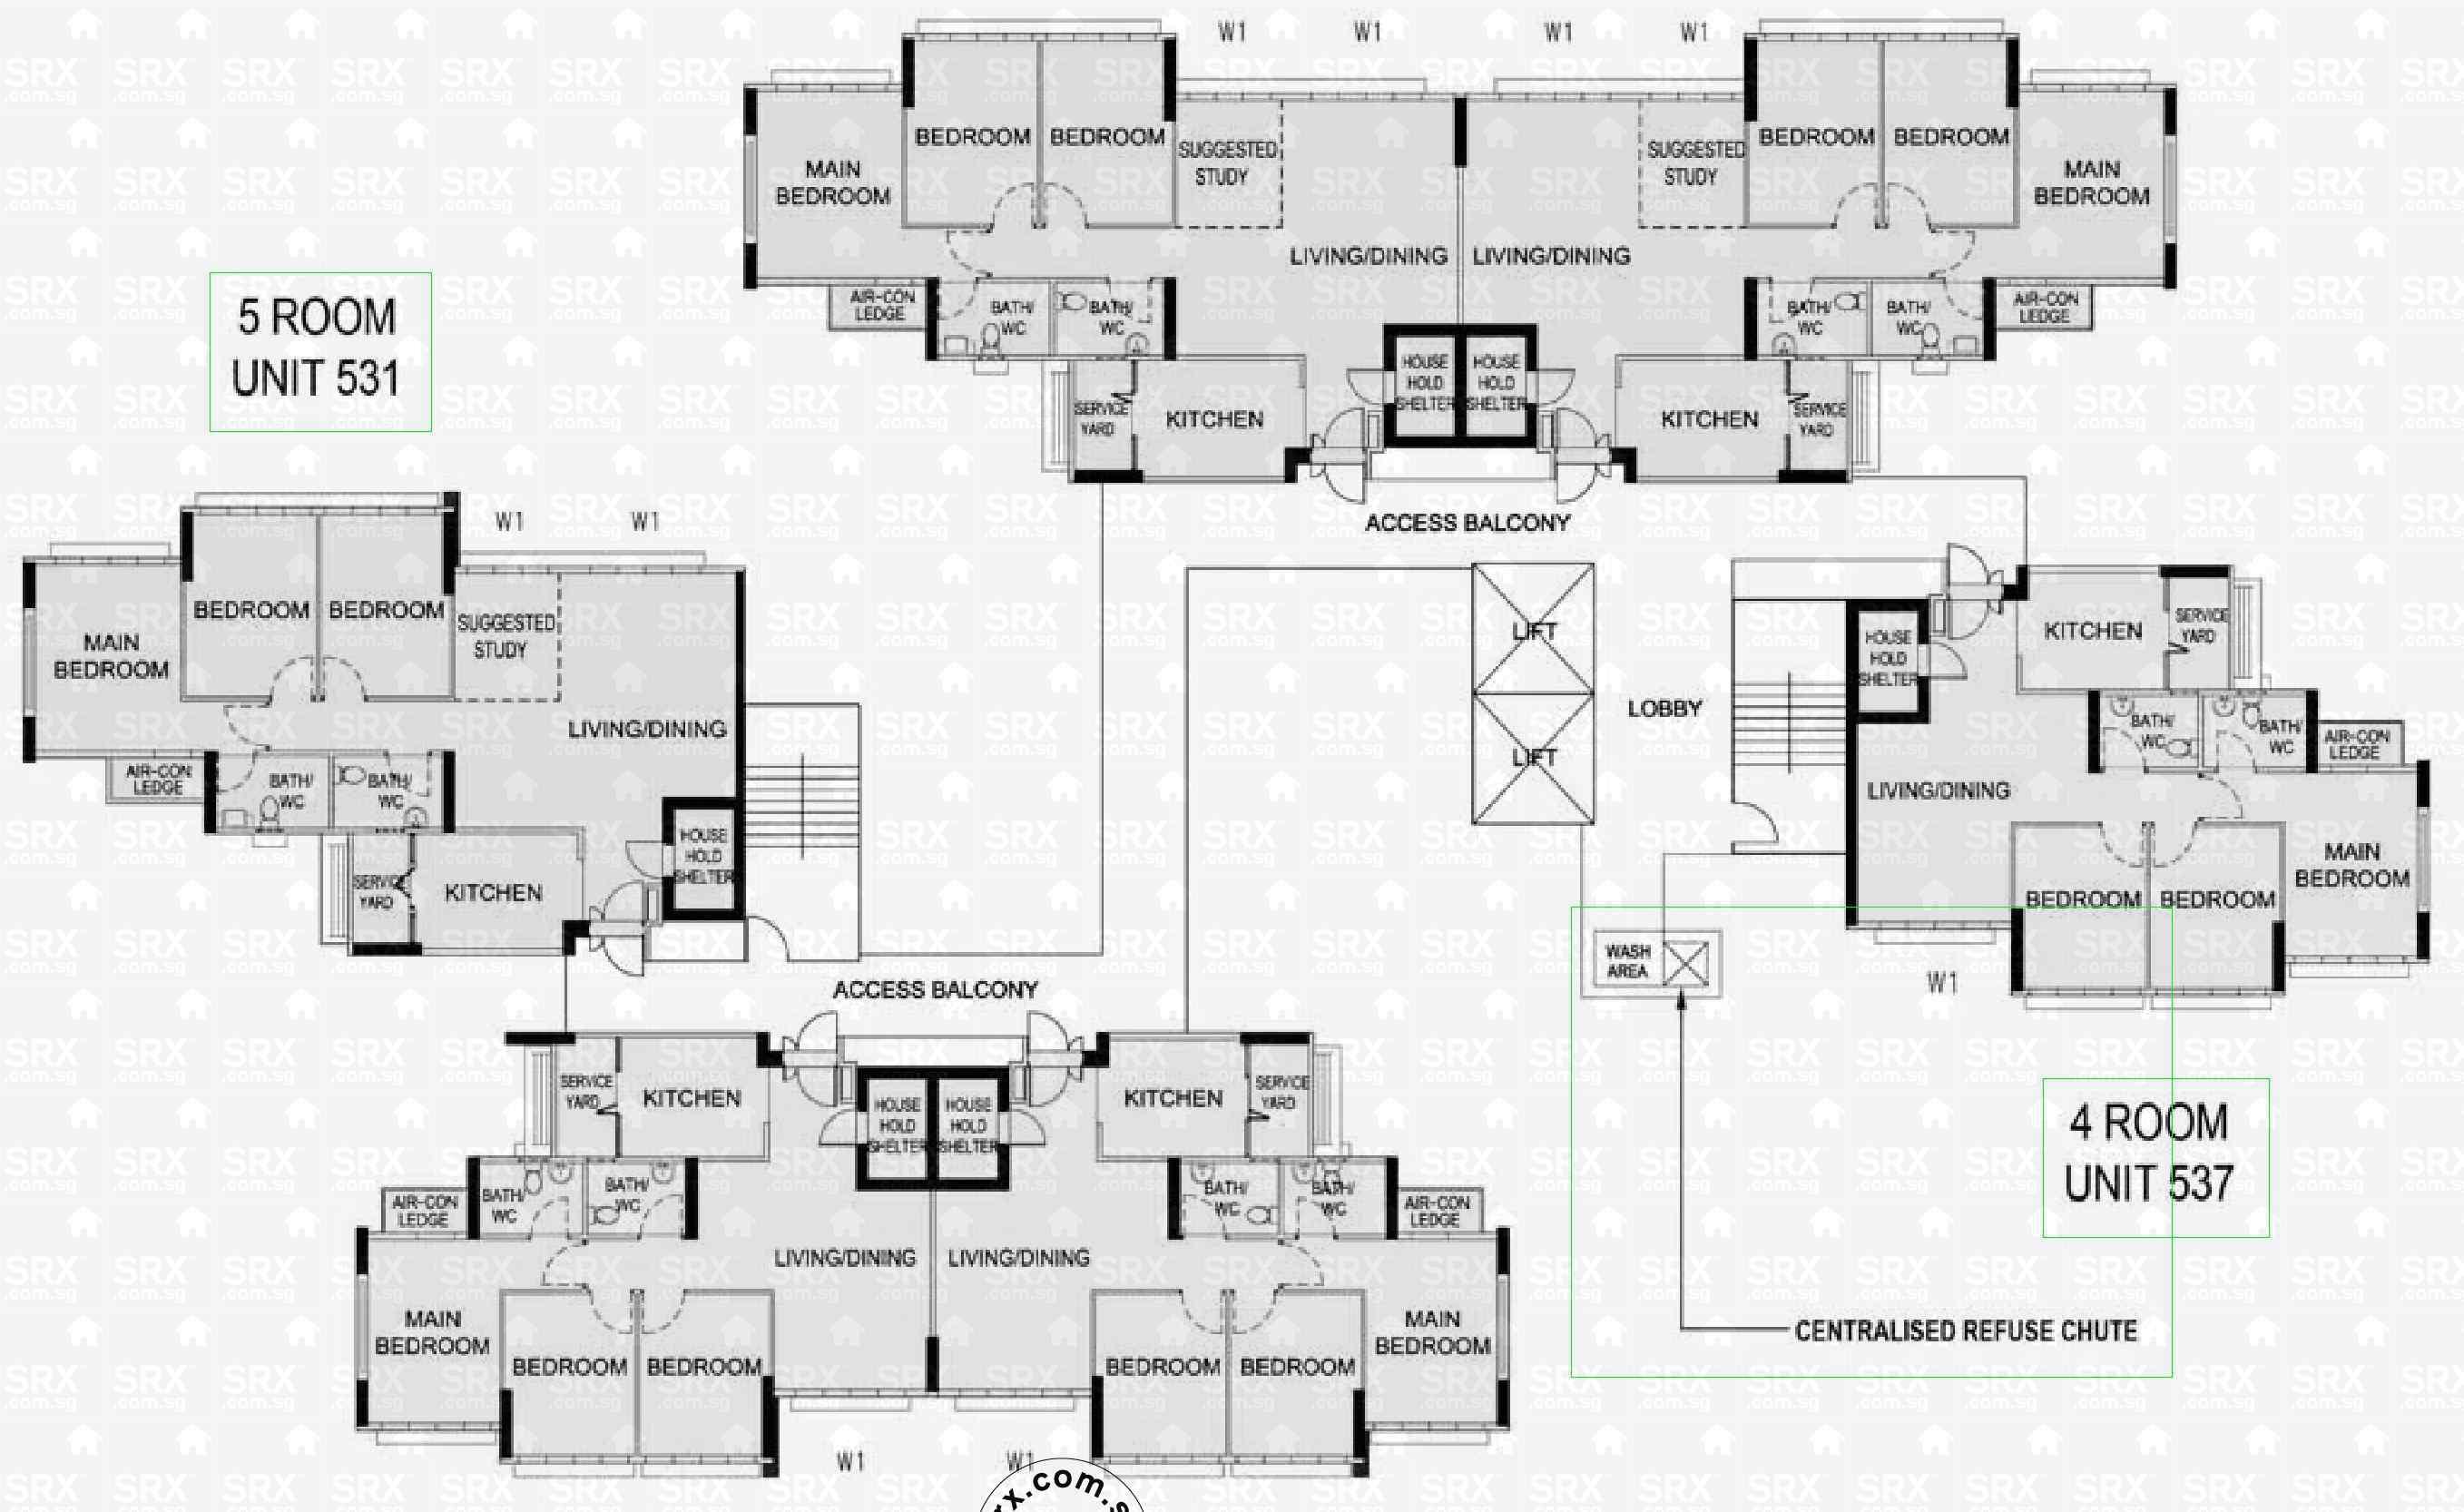 compassvale bow hdb details srx property eastpoint green 1 simei street 3 3 bedrooms 1180 sqft